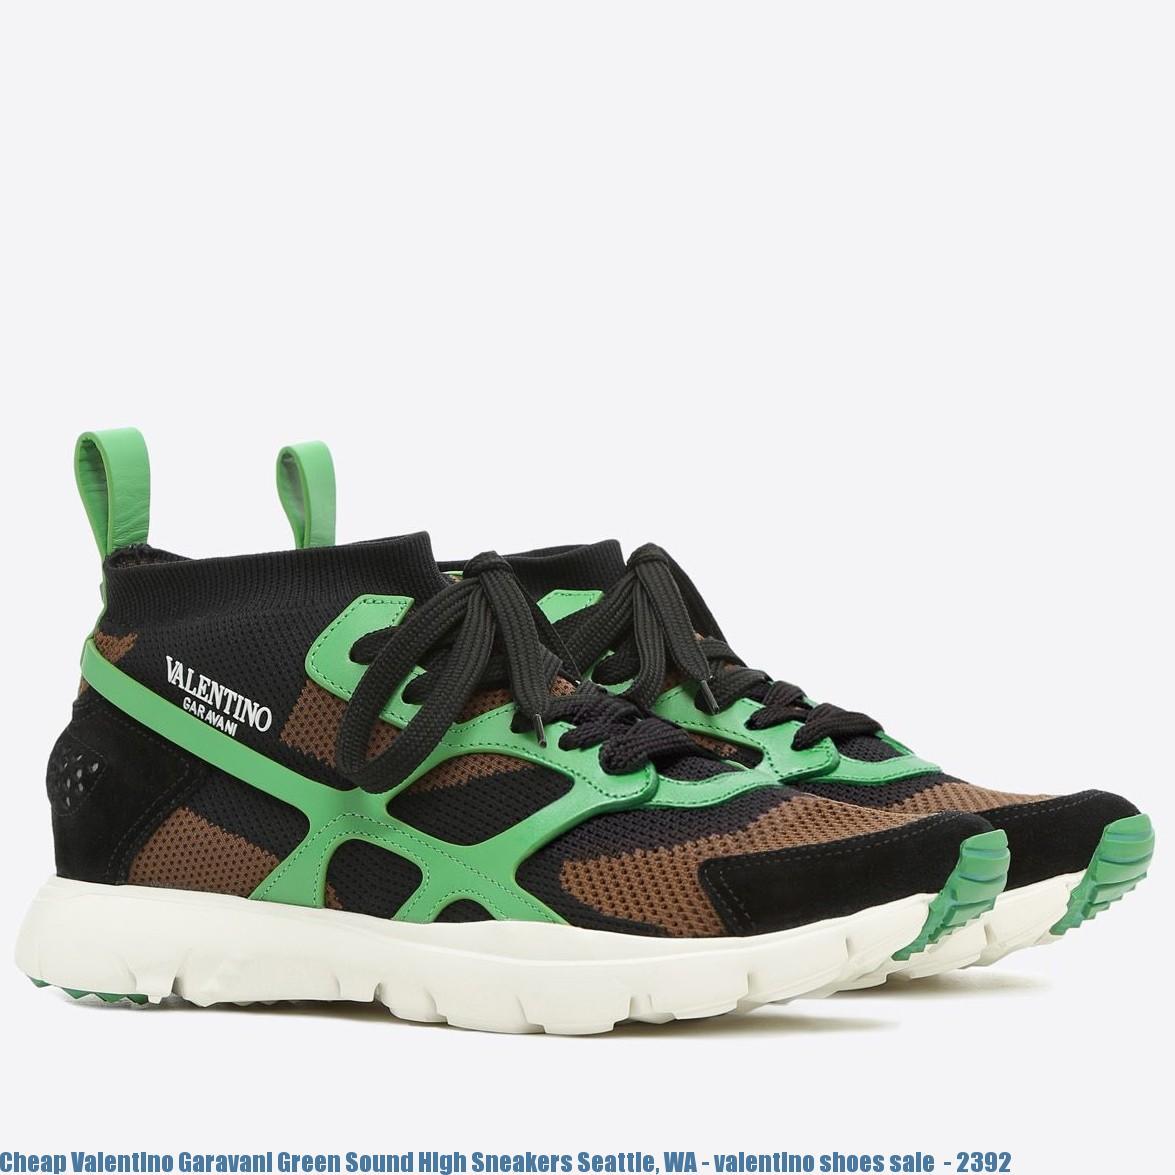 0df2bee559 Cheap Valentino Garavani Green Sound High Sneakers Seattle, WA - valentino  shoes sale - 2392